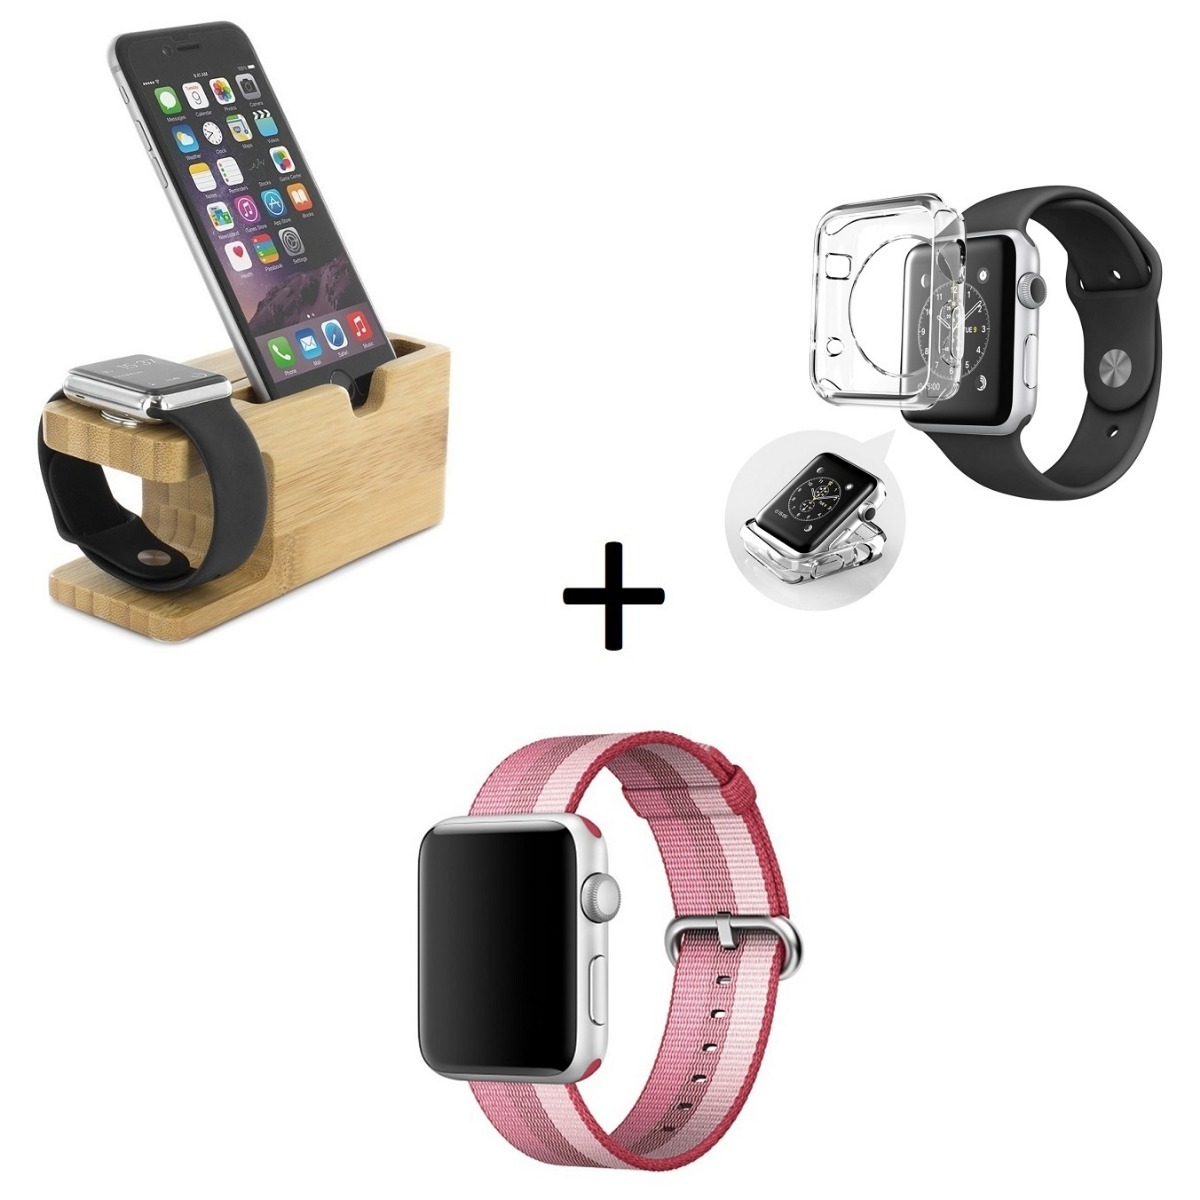 4d0fbcaf919 kit base apple watch e iphone bambu + pulseira nylon + case. Carregando zoom .